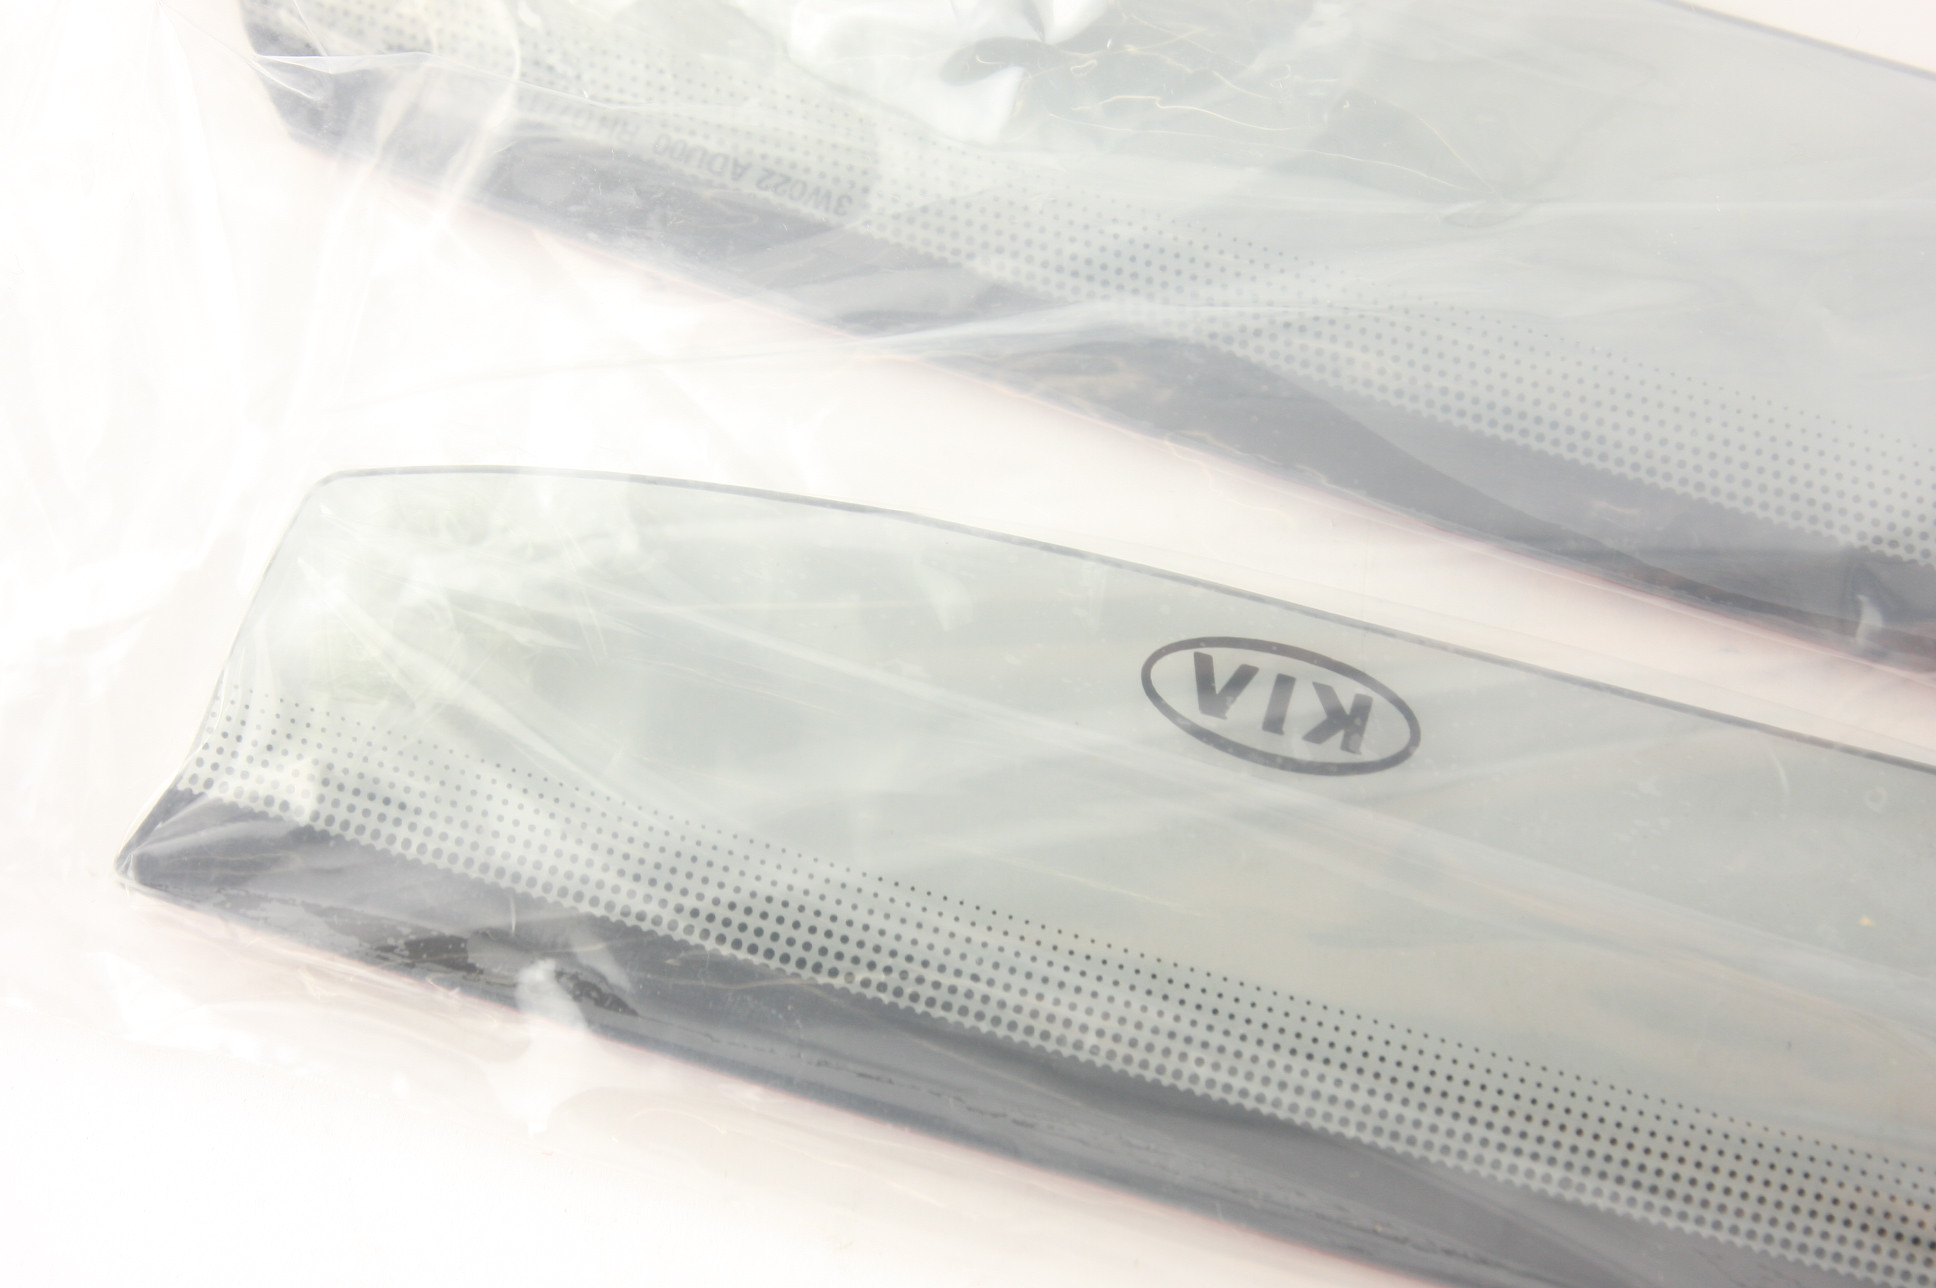 **~ New OEM 3W022ADU00 Kia Sportage Sport Visors Rain Guards set of 4 Vents - image 7